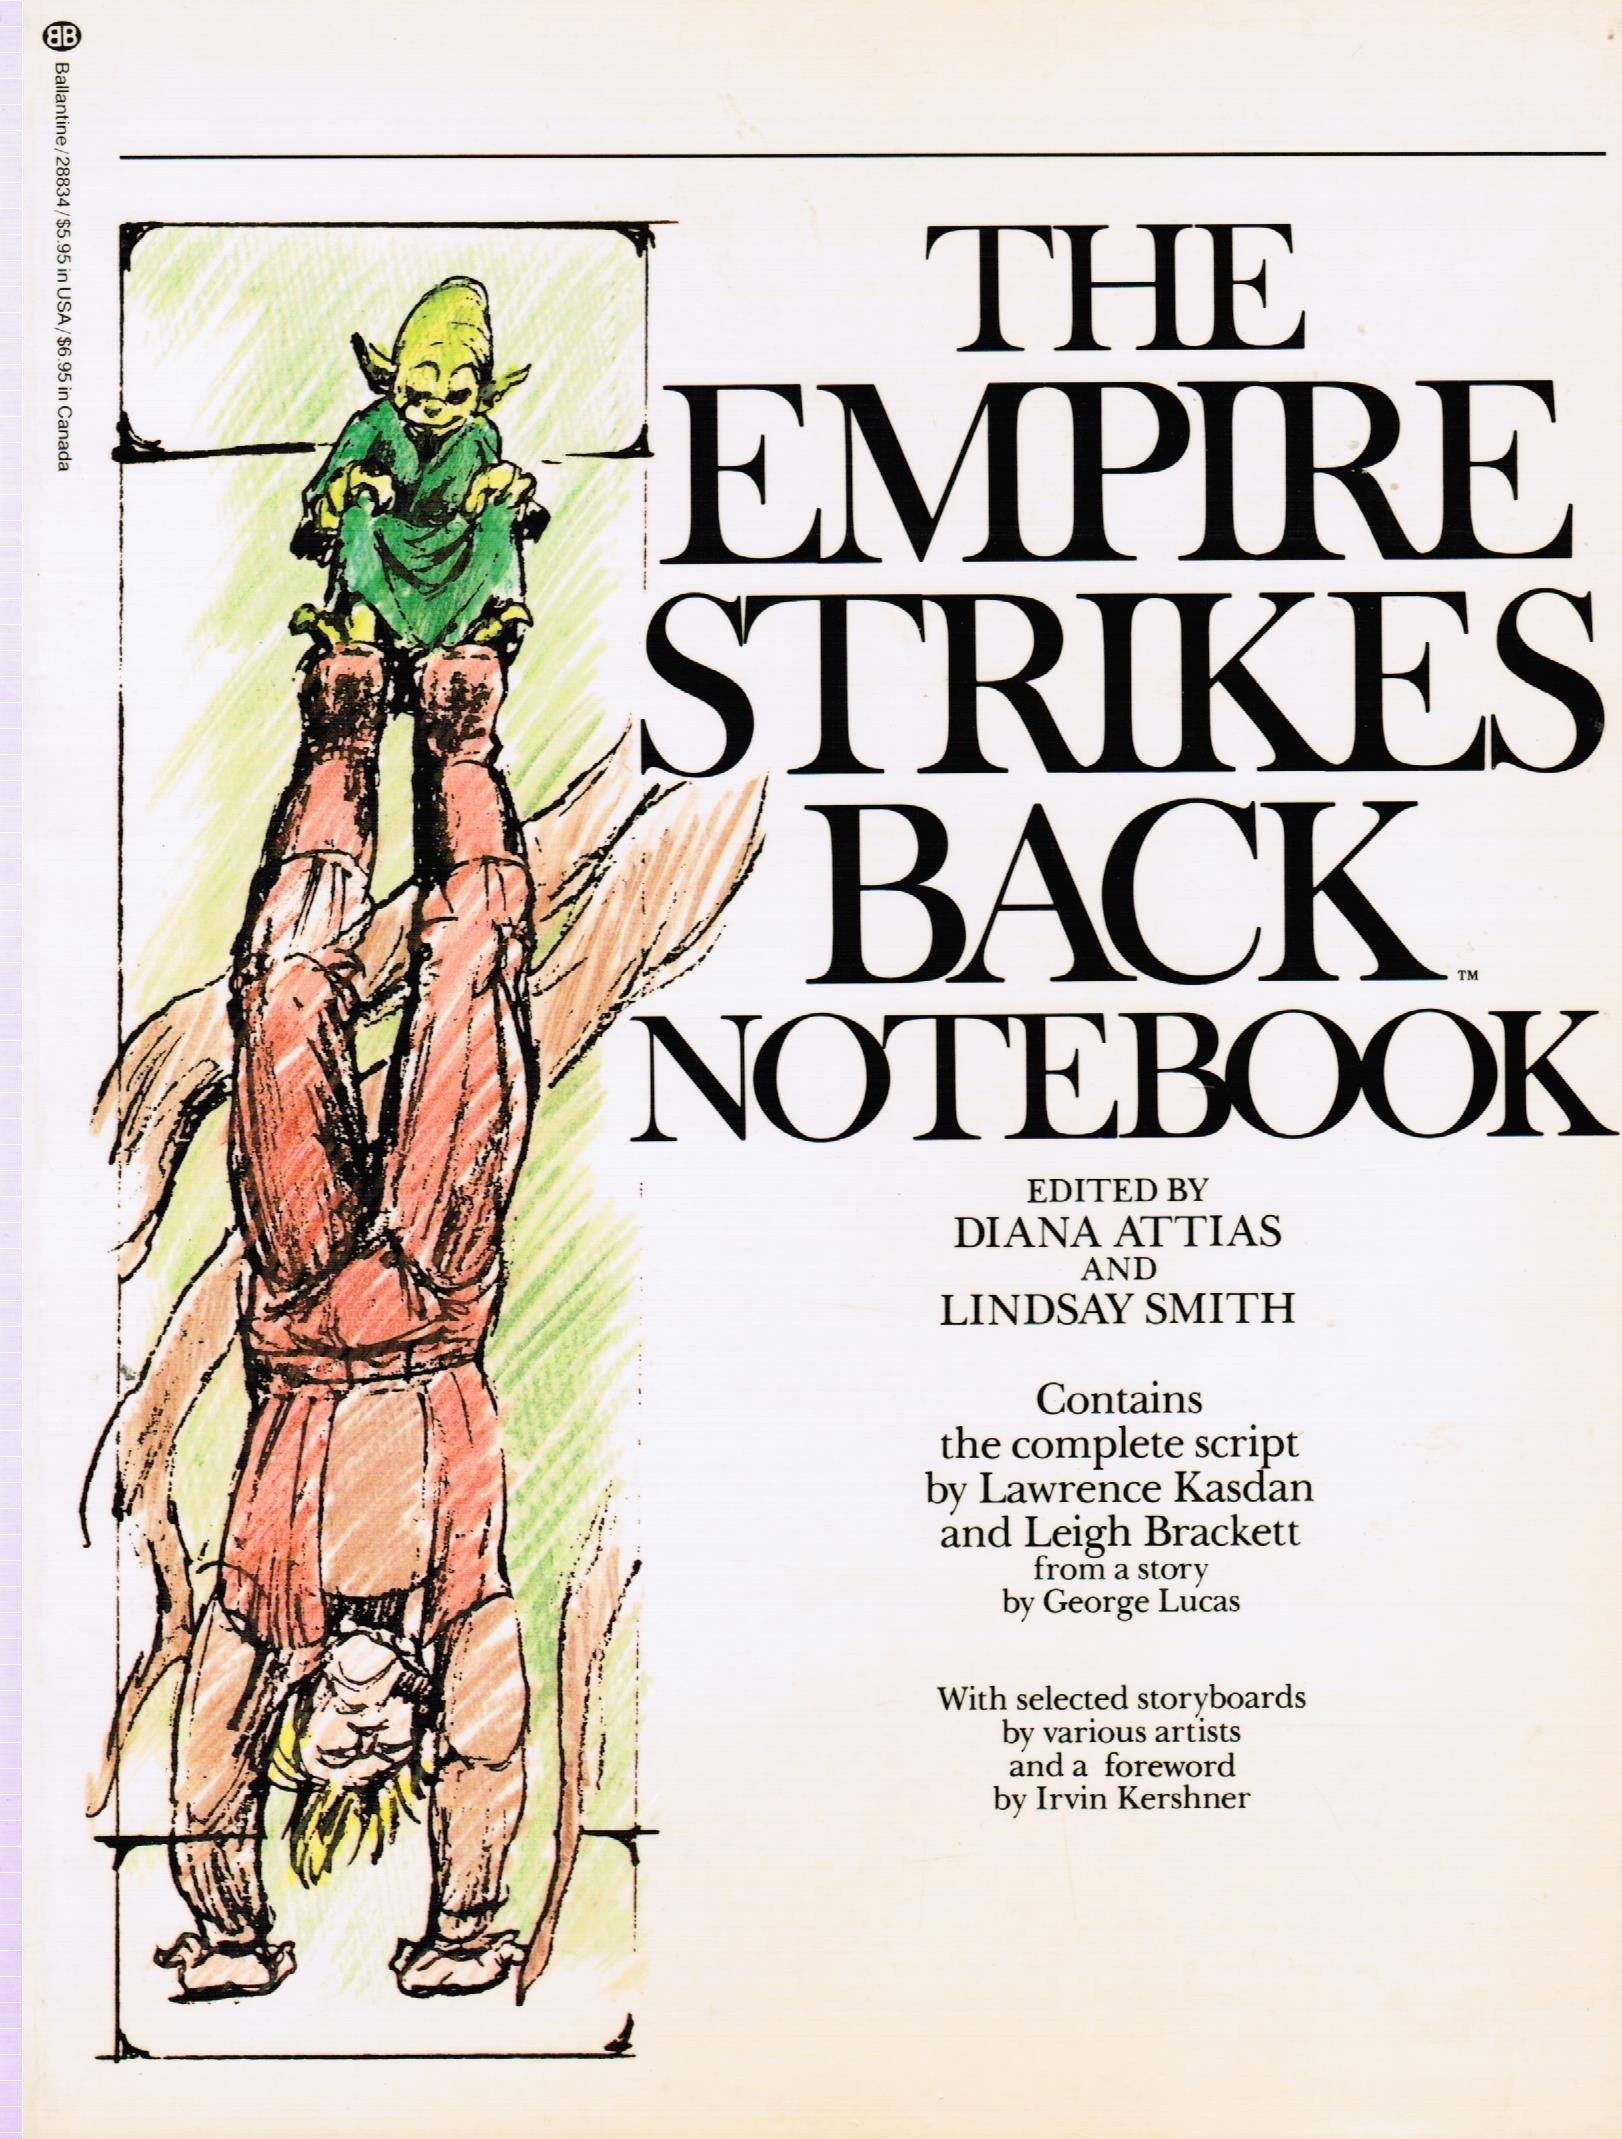 The Empire Strikes Back Notebook, Attias, Diana & Smith, Lindsay & Kasdan, Lawrence & Brackett, Leigh & Lucas, George